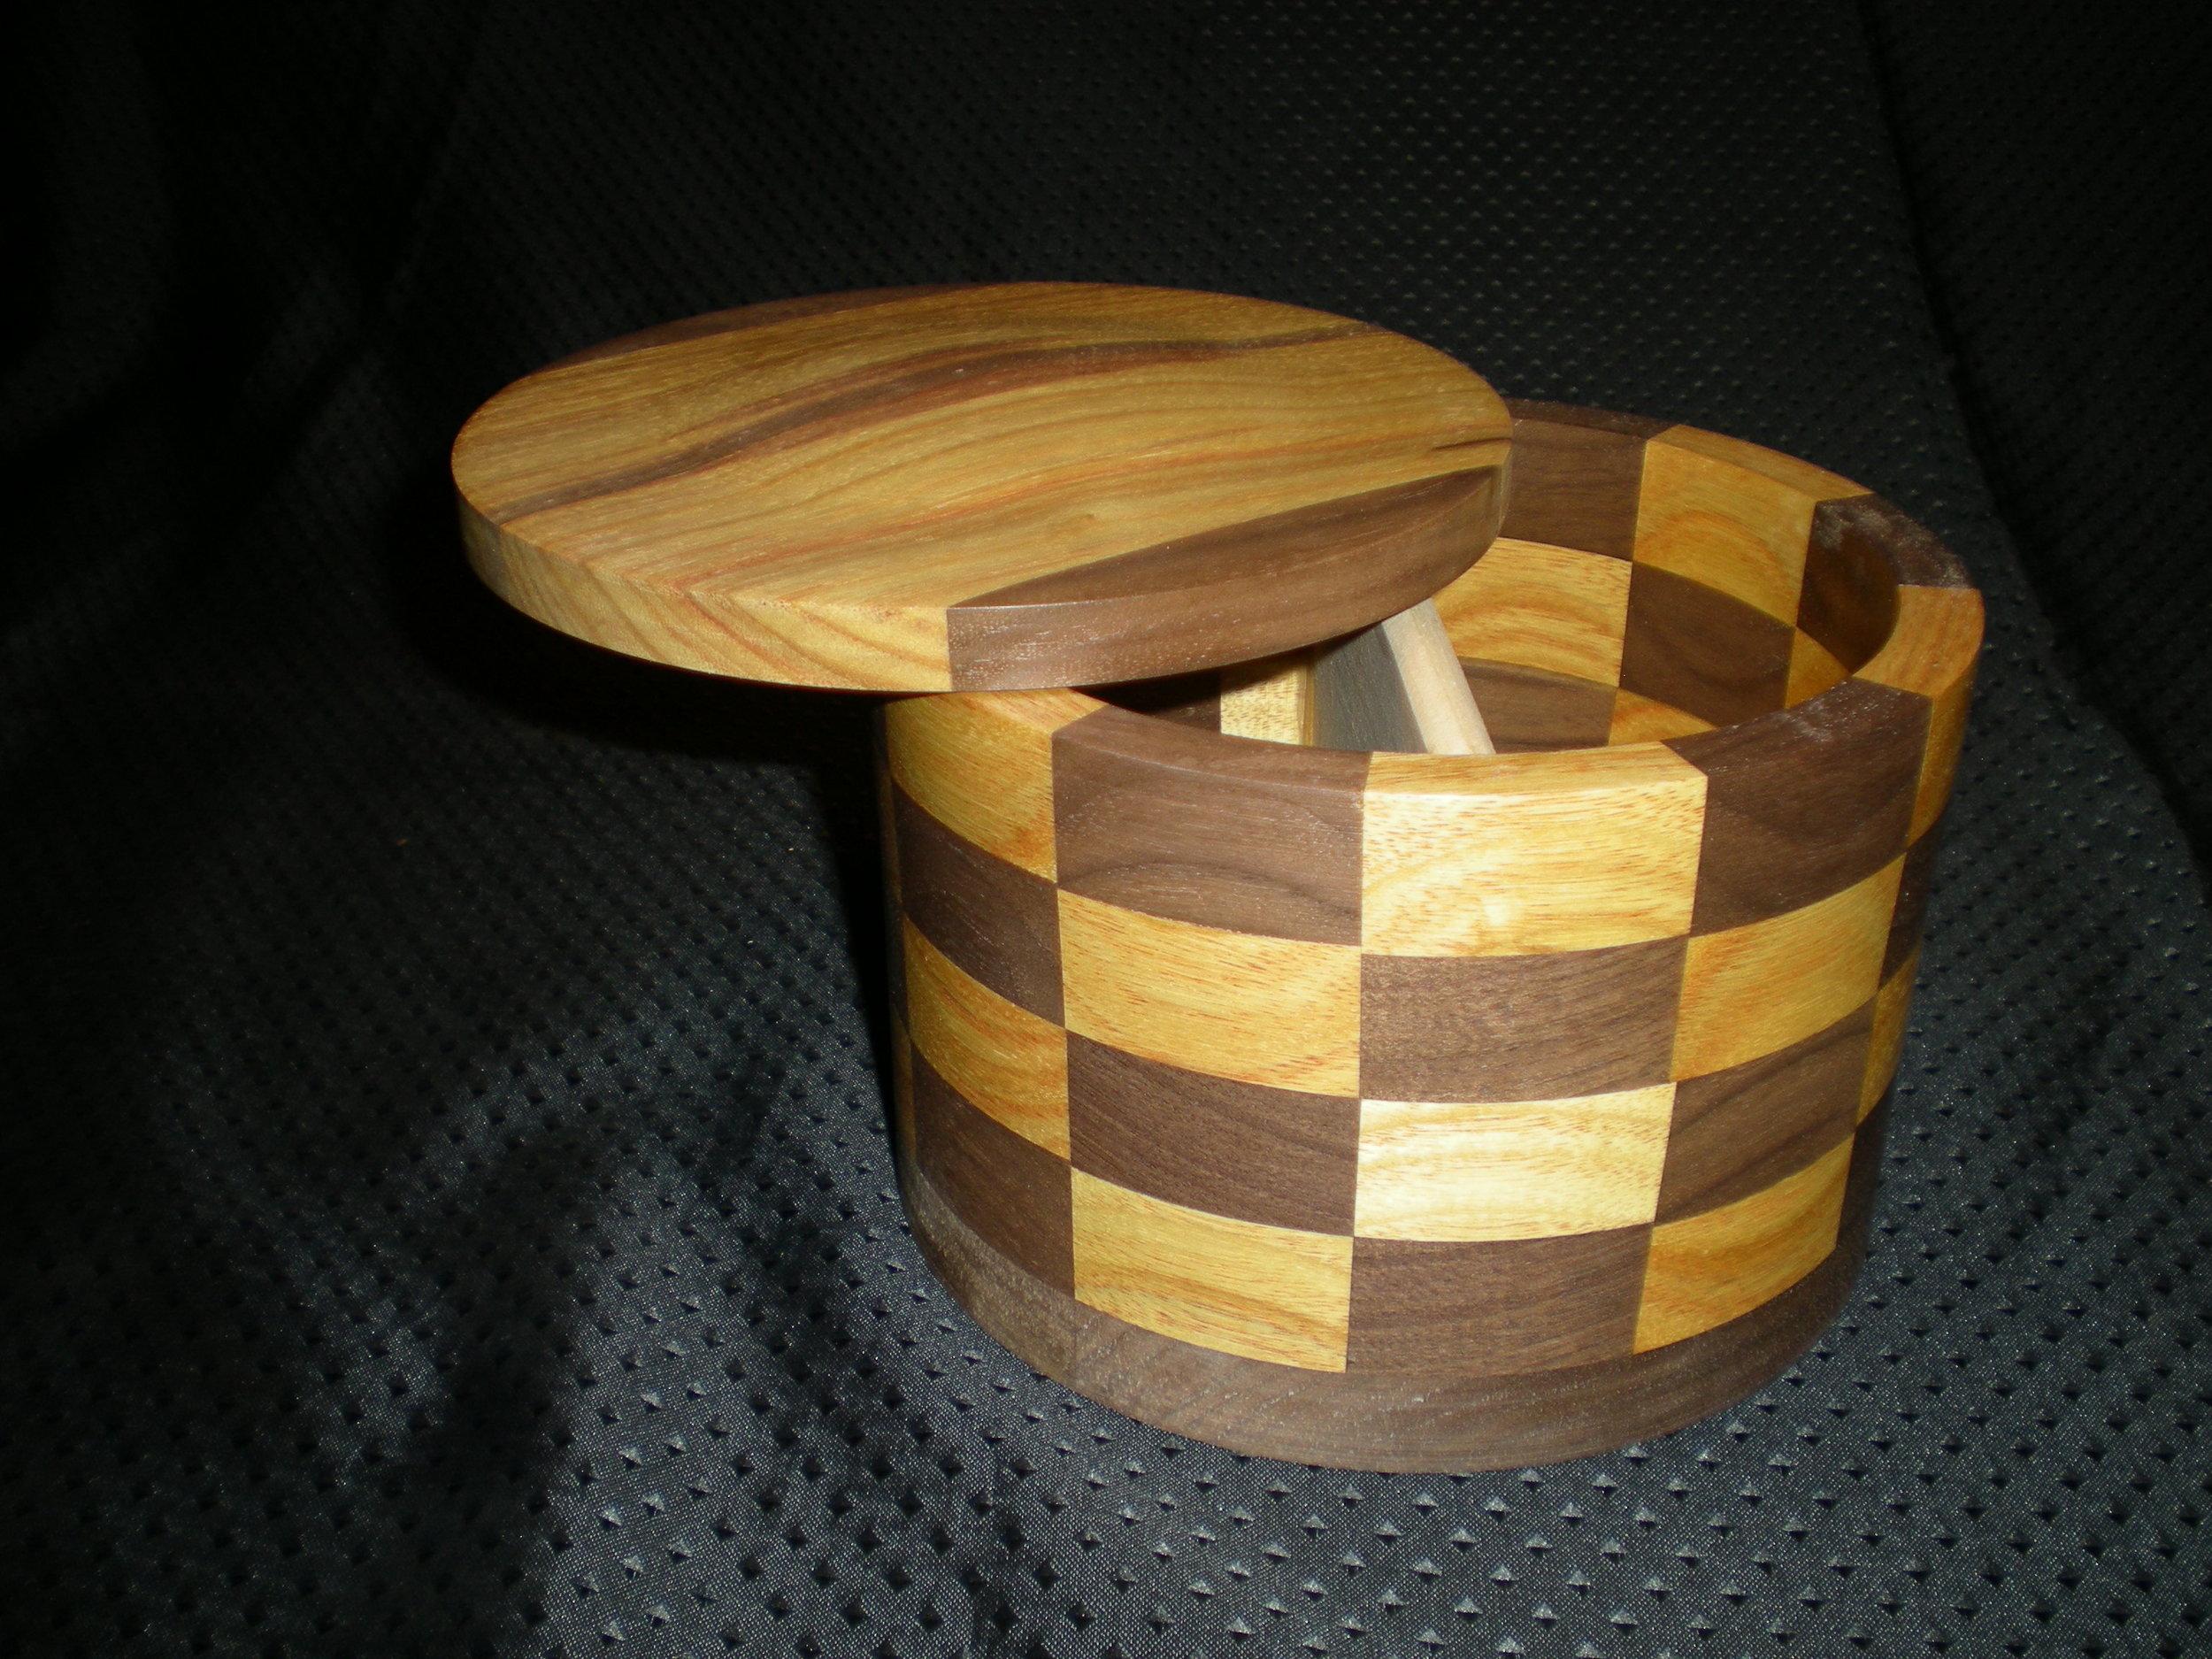 RJC Wood Creations - Bowls (19).JPG